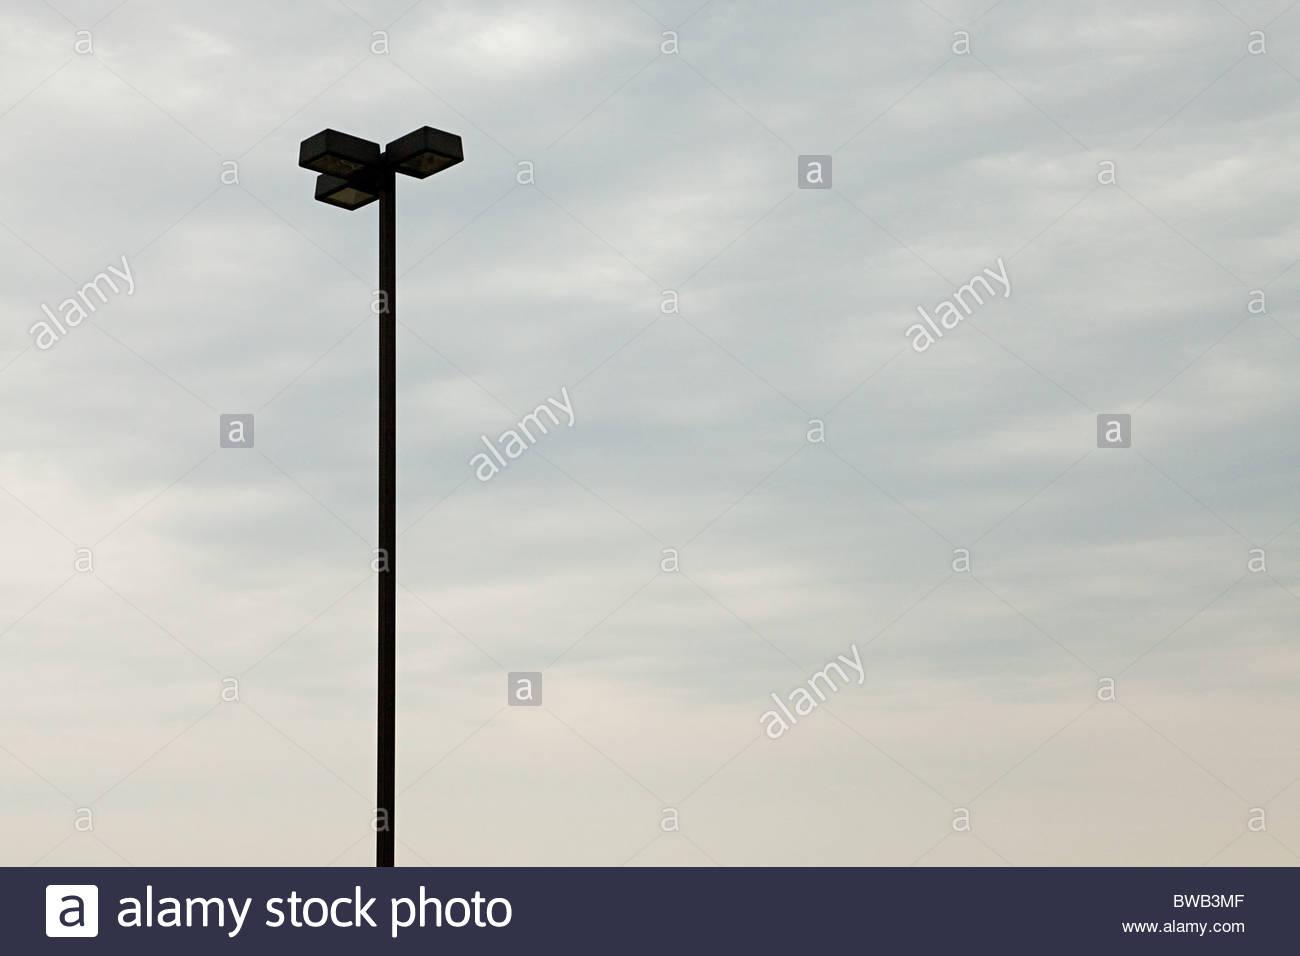 Lamp post against sky - Stock Image